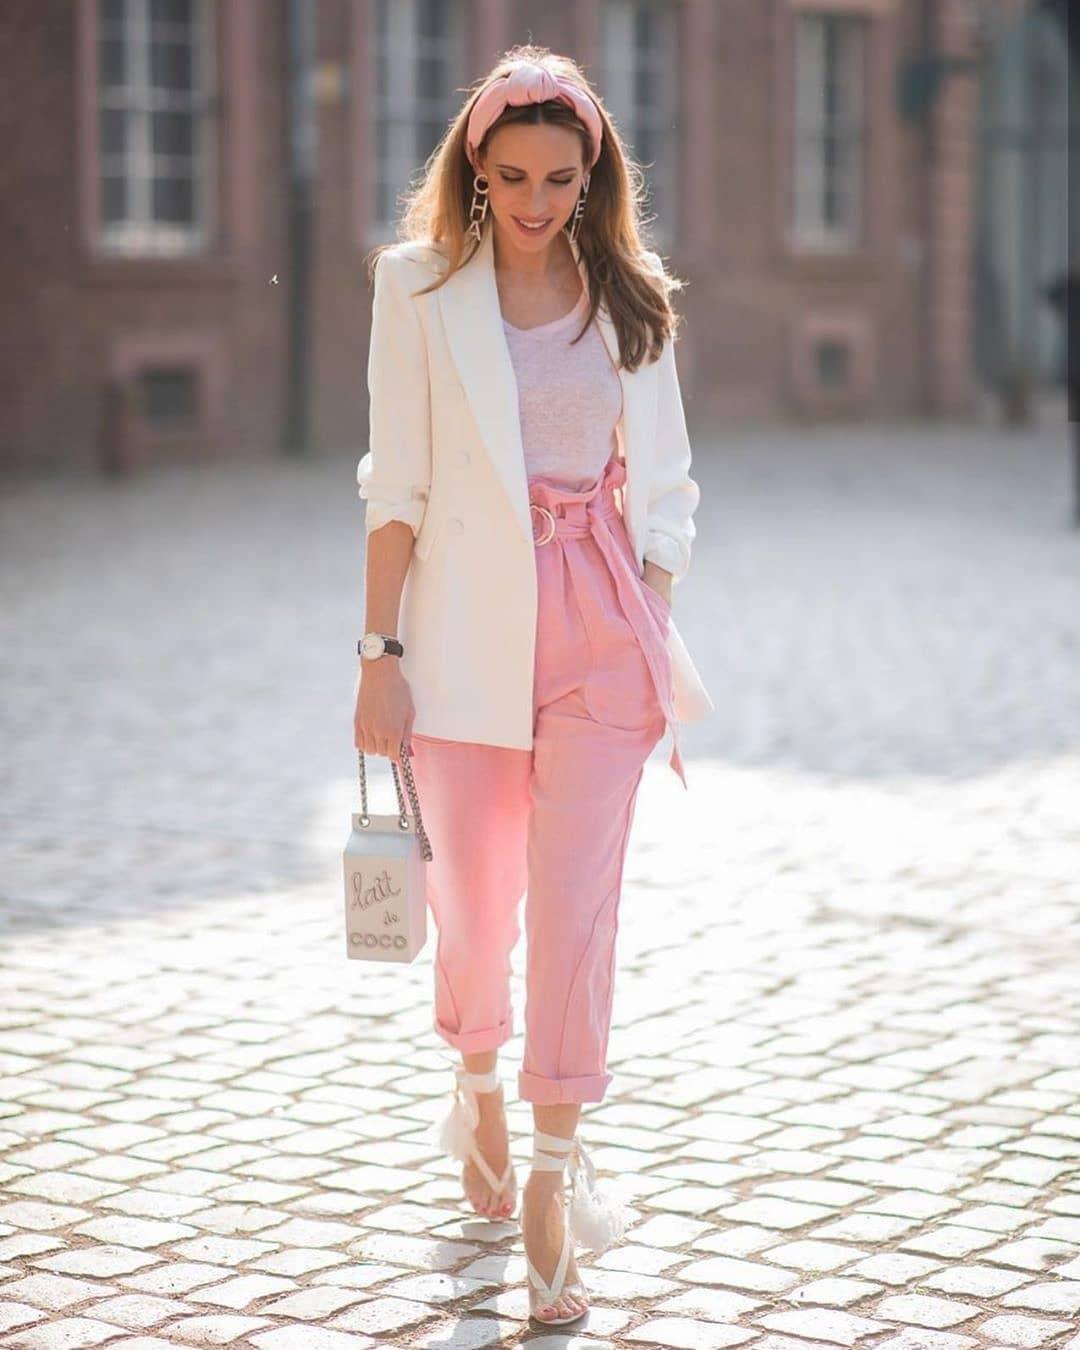 street_style_paris_12_5_2019_13_45_5_640.jpg